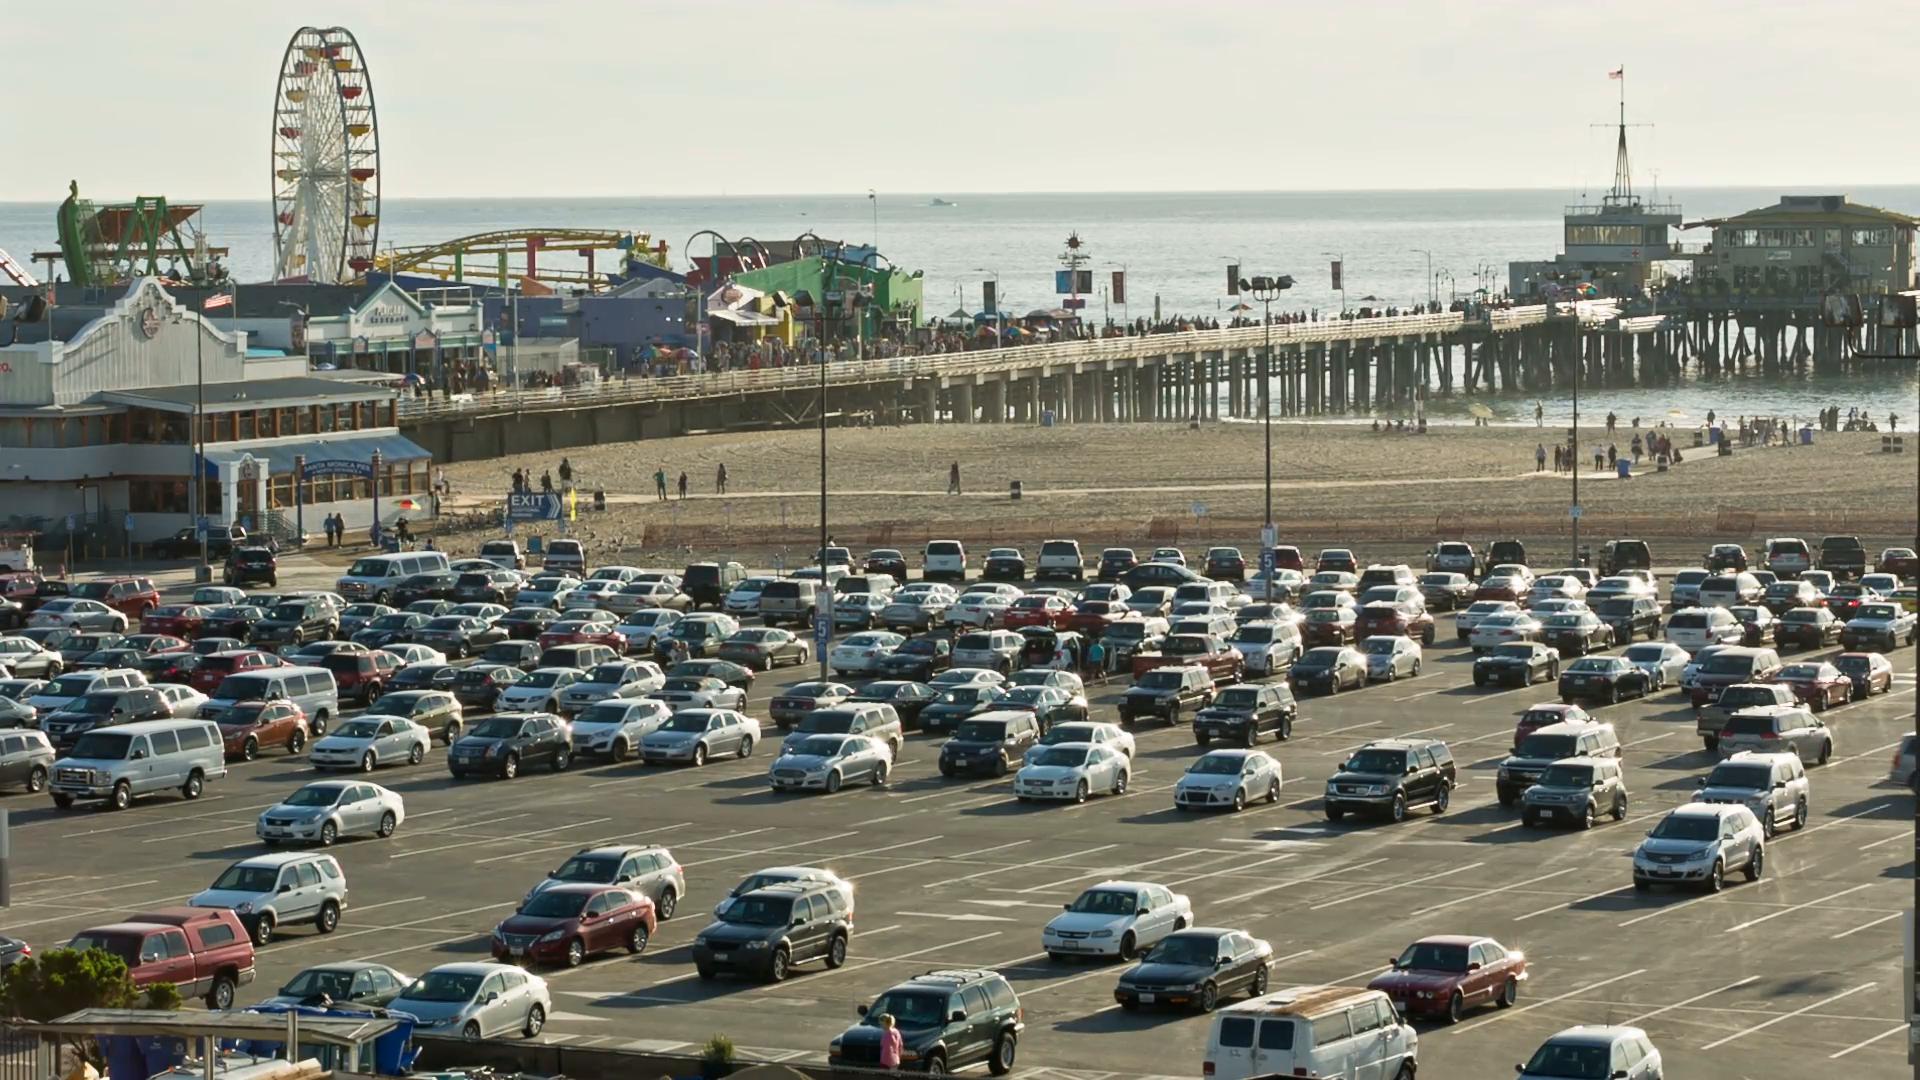 busy parking lot outside Santa Monica Pier, cars parking with ferris wheel  in background 1080 HD Stock Video Footage - VideoBlocks - Parking Lot PNG HD